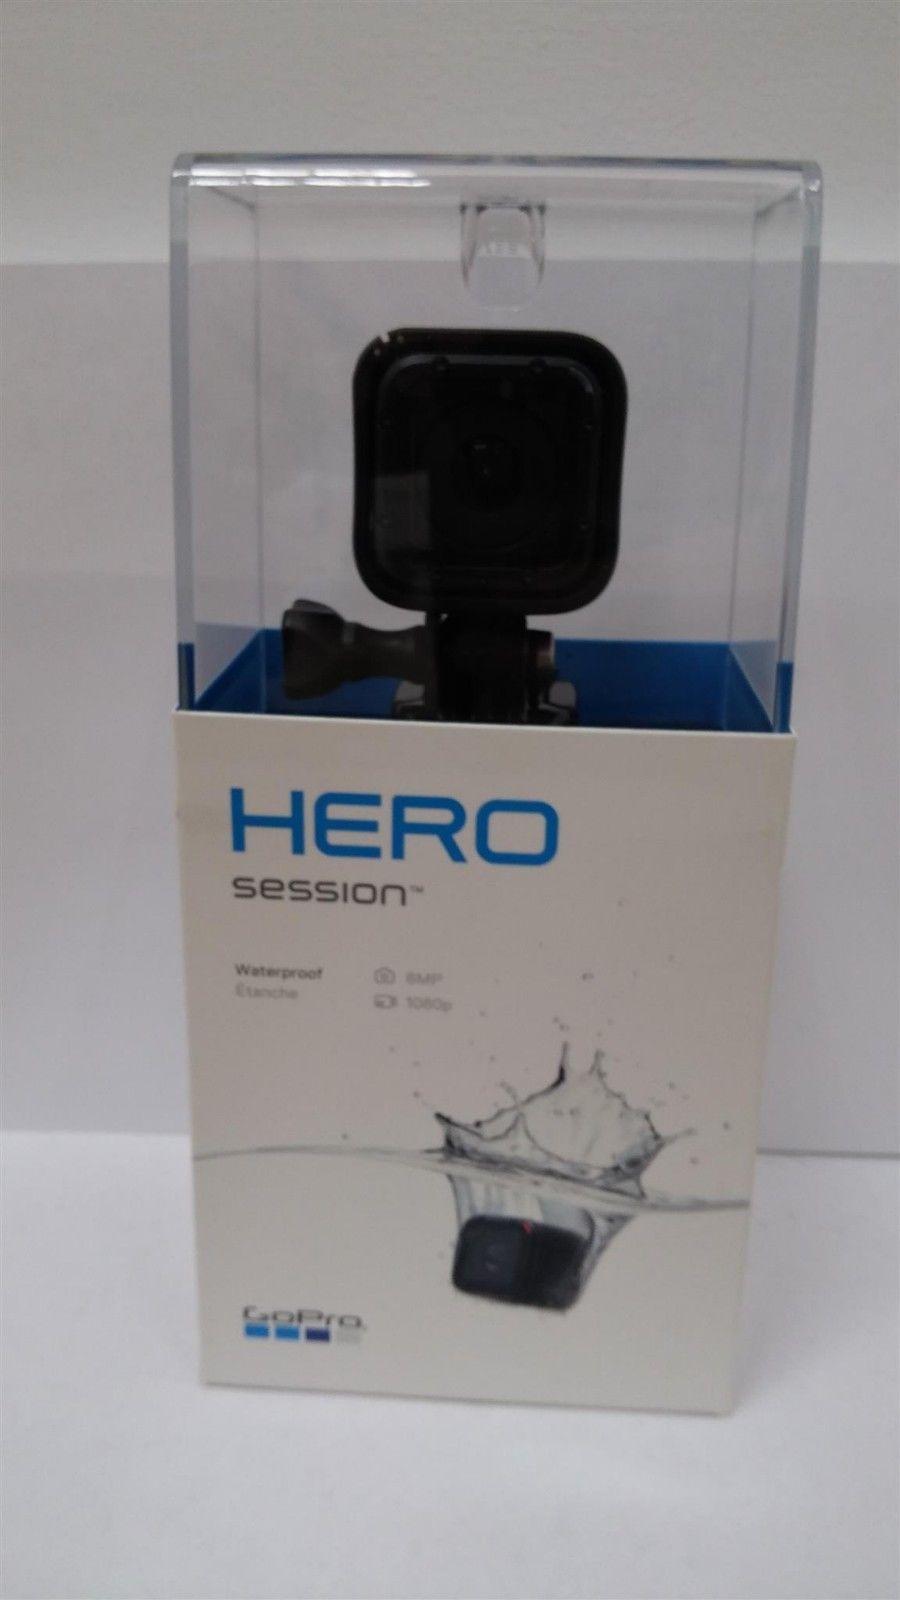 GoPro Hero Session Model HD, Wi-Fi Watertight Digicam